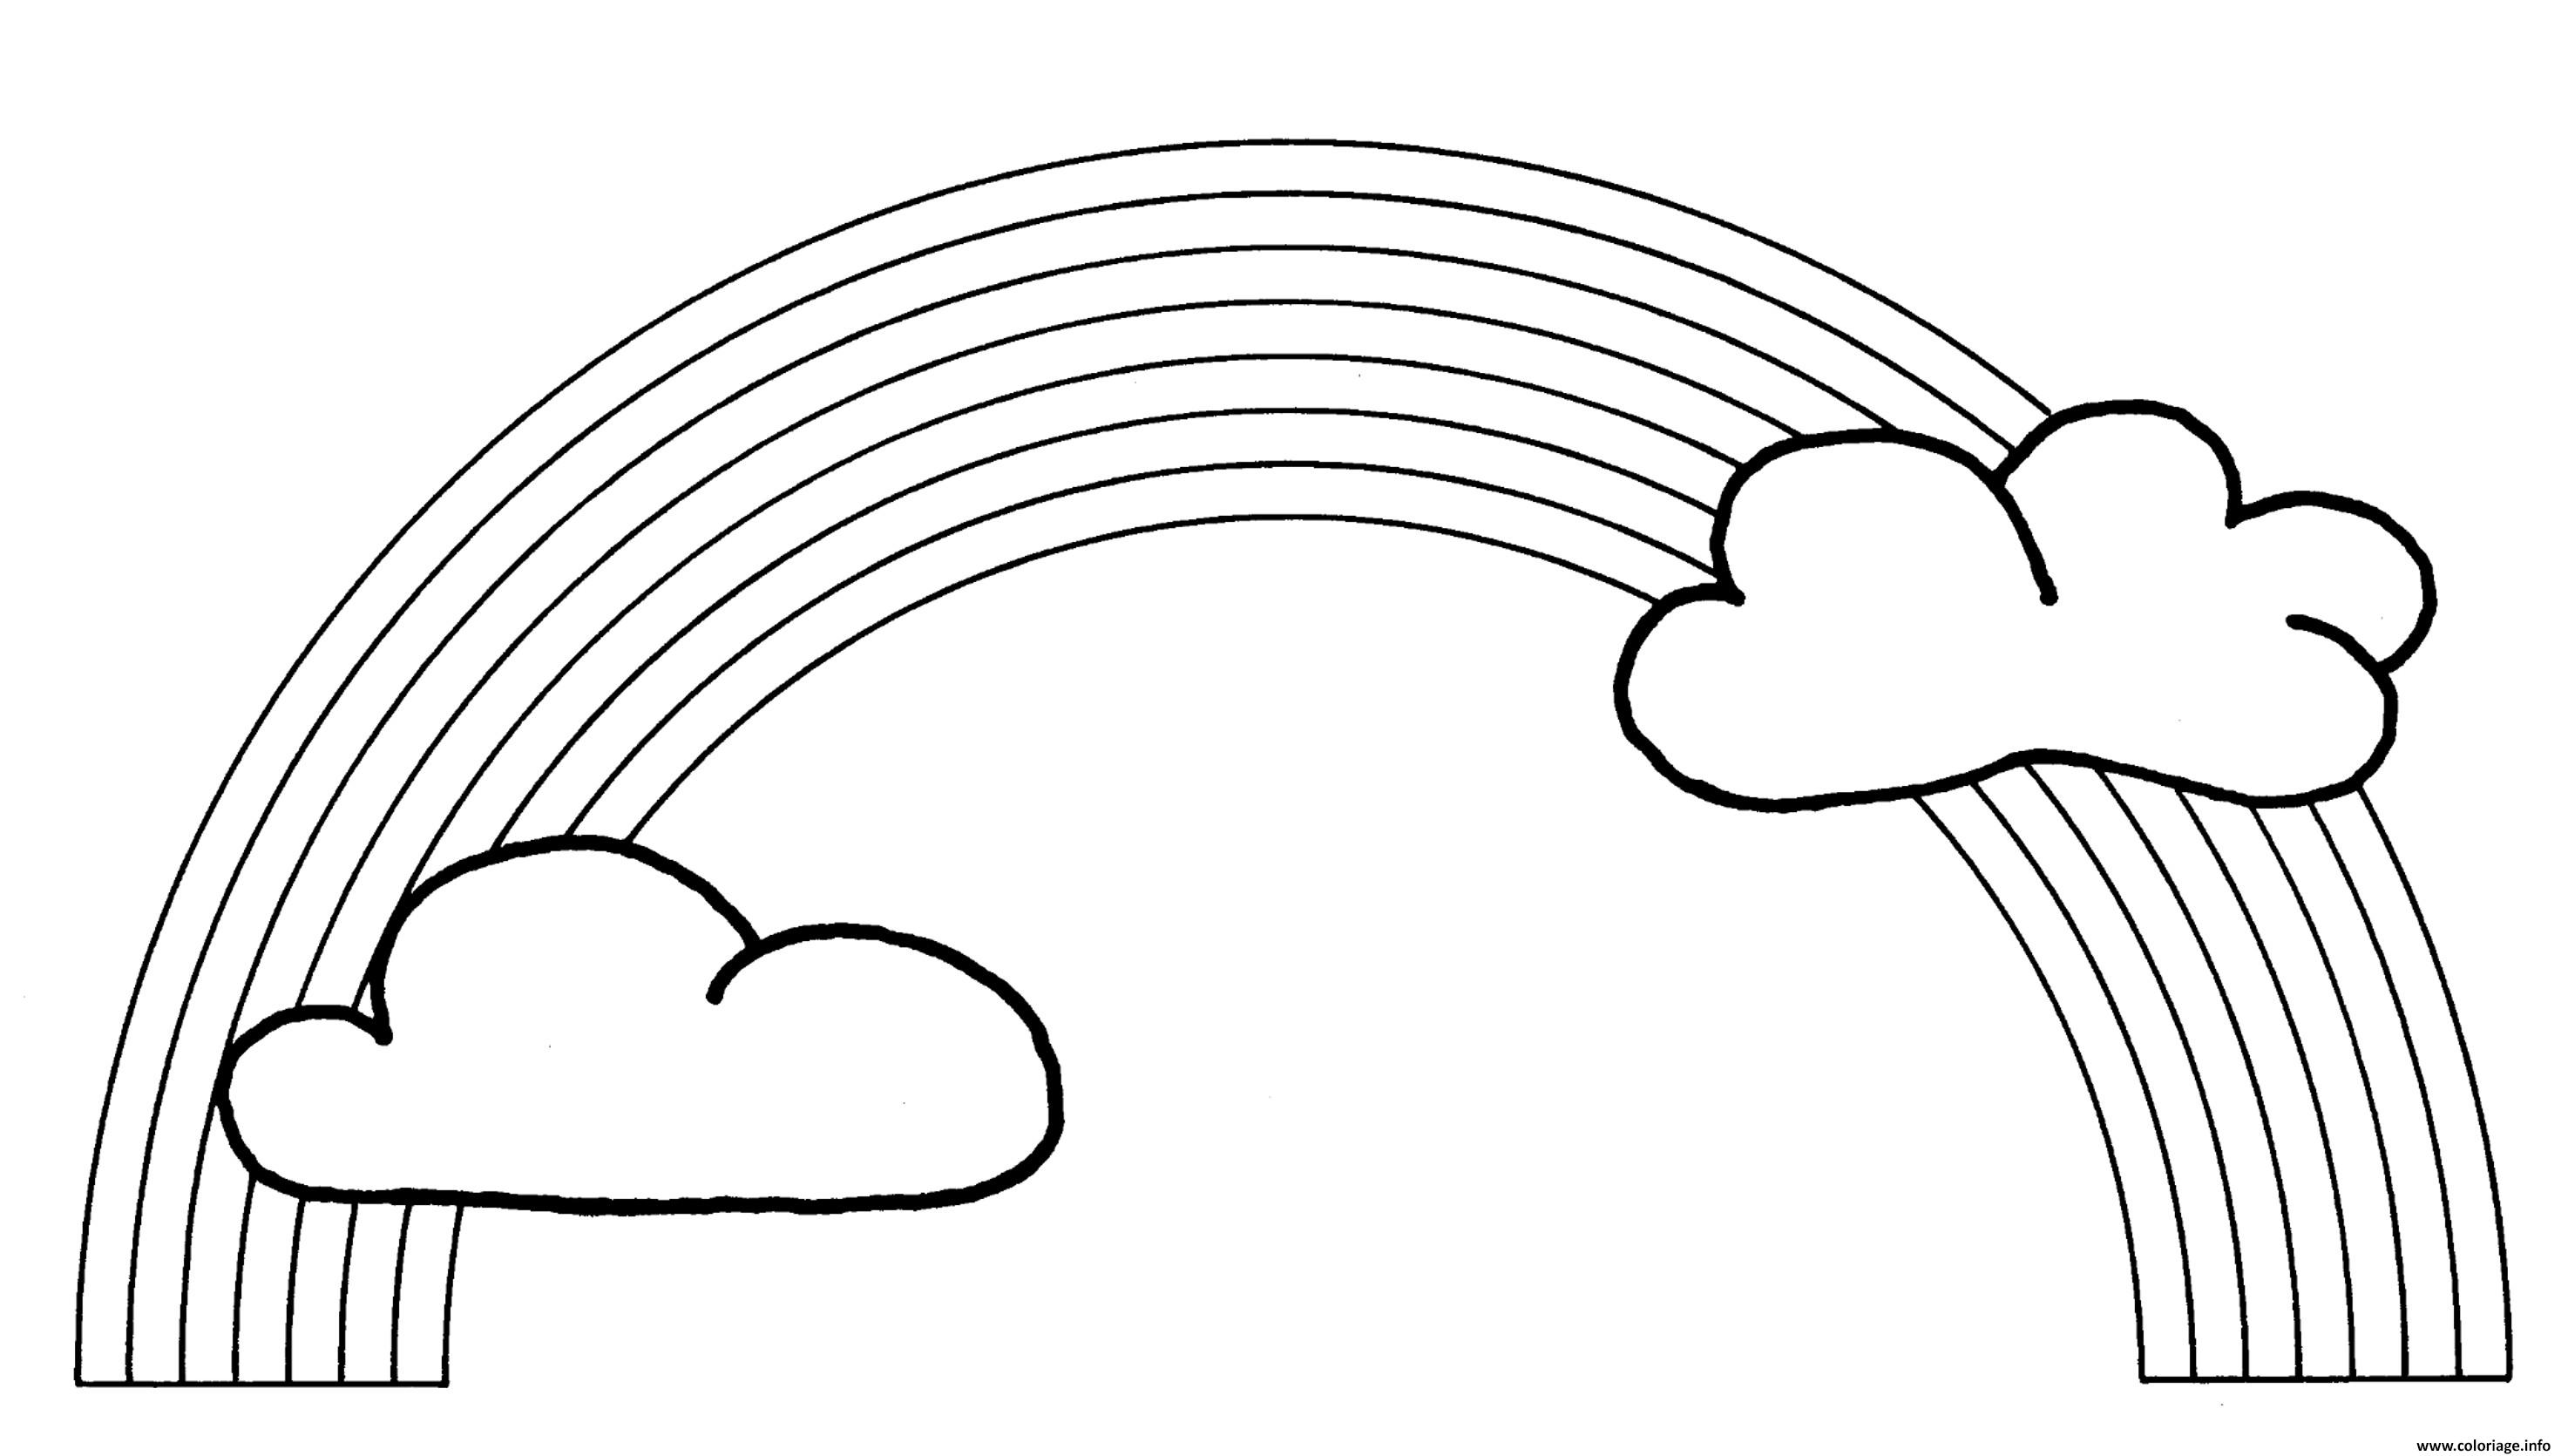 Coloriage arc en ciel avec nuage - Coloriage ciel ...